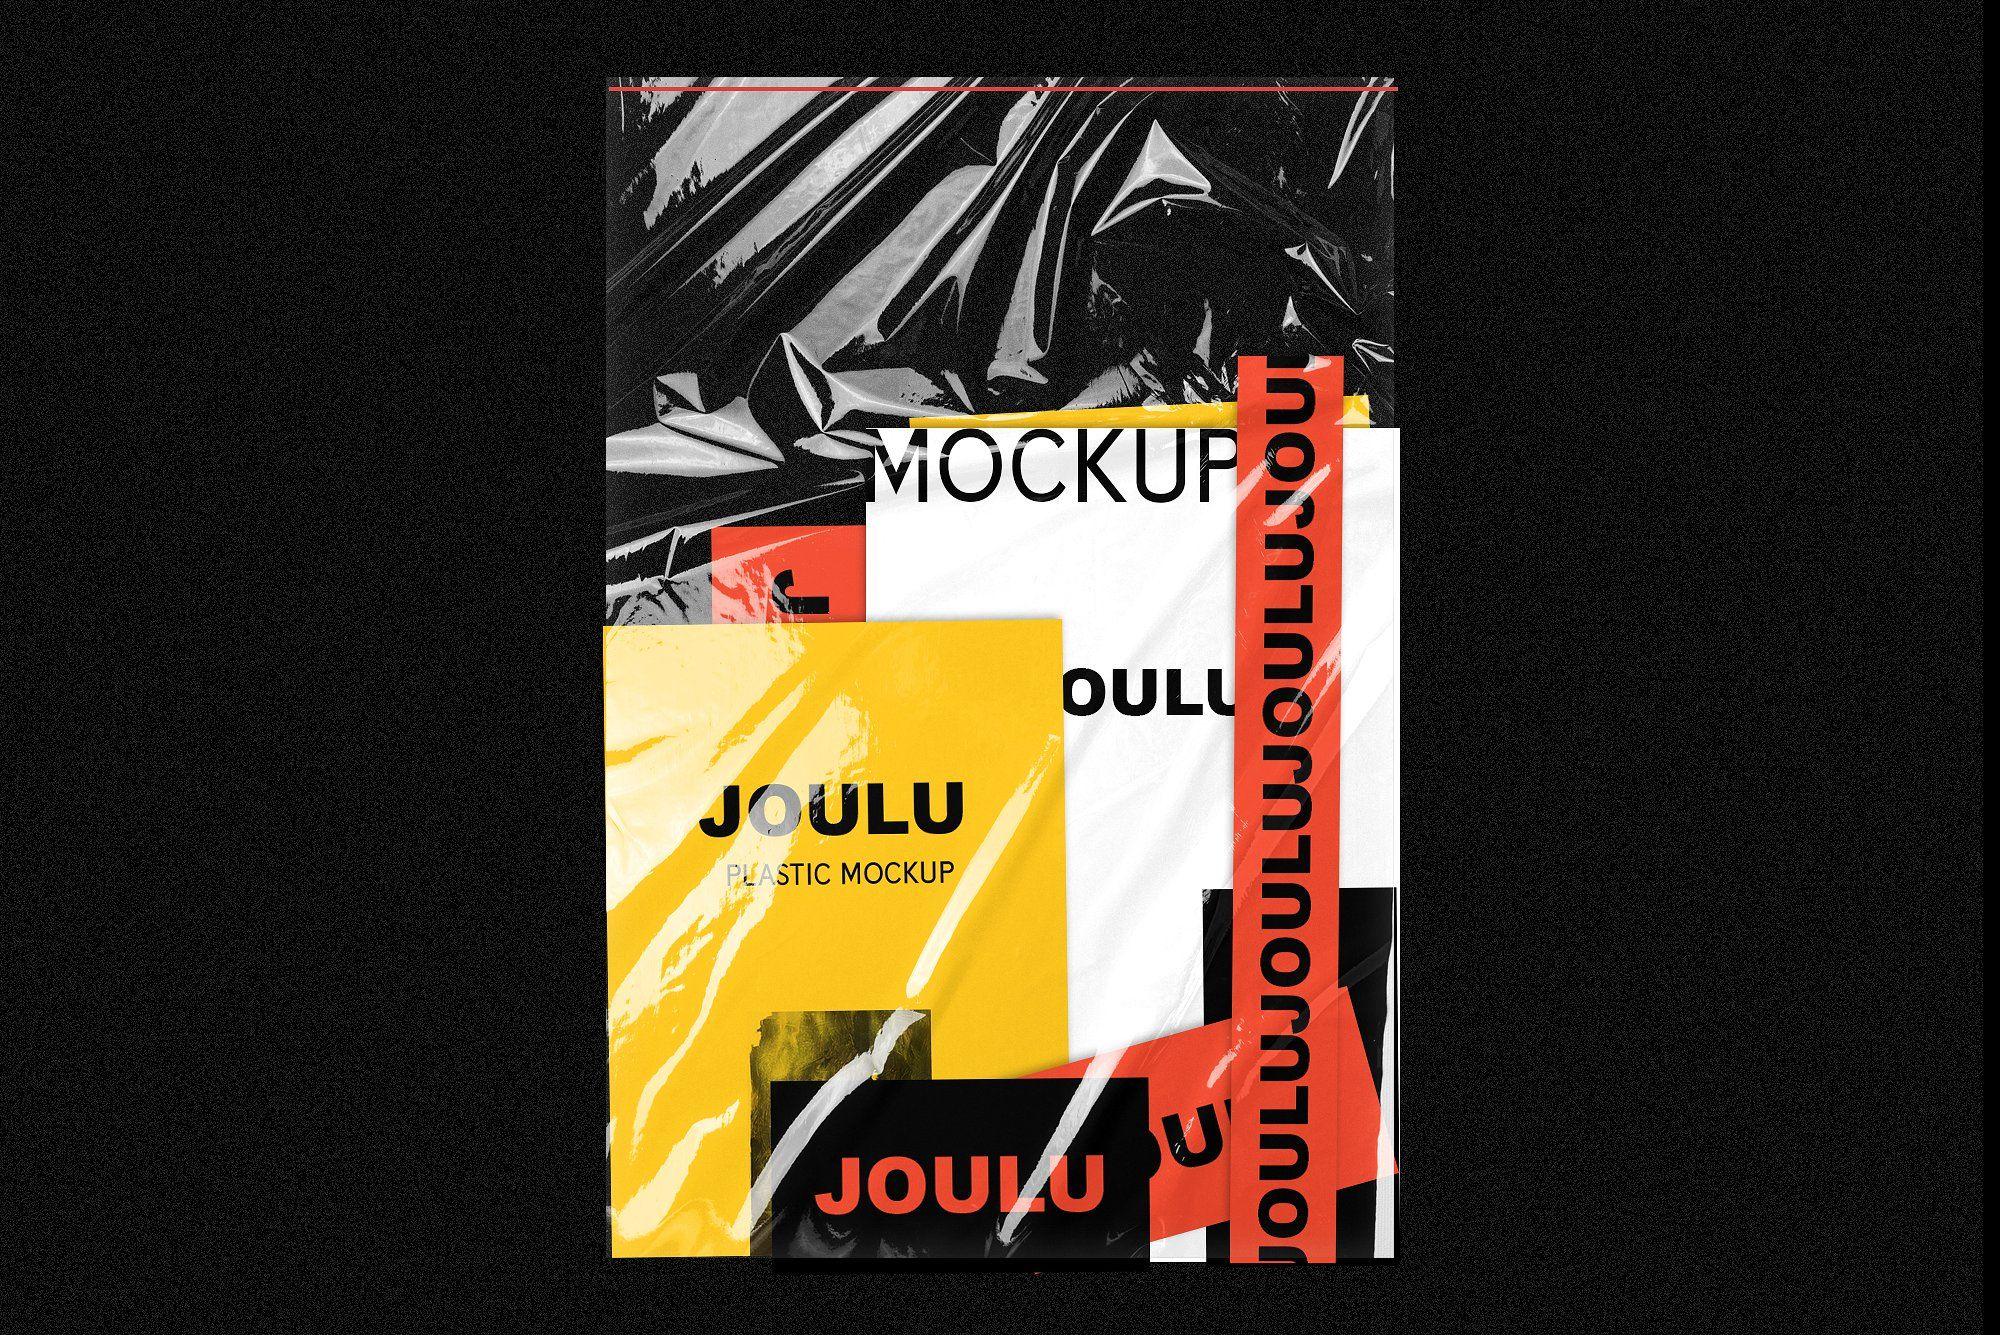 Joulu Plastic Wrinkle Mockup Stationery Mockup Plastic Texture Fashion Logo Branding